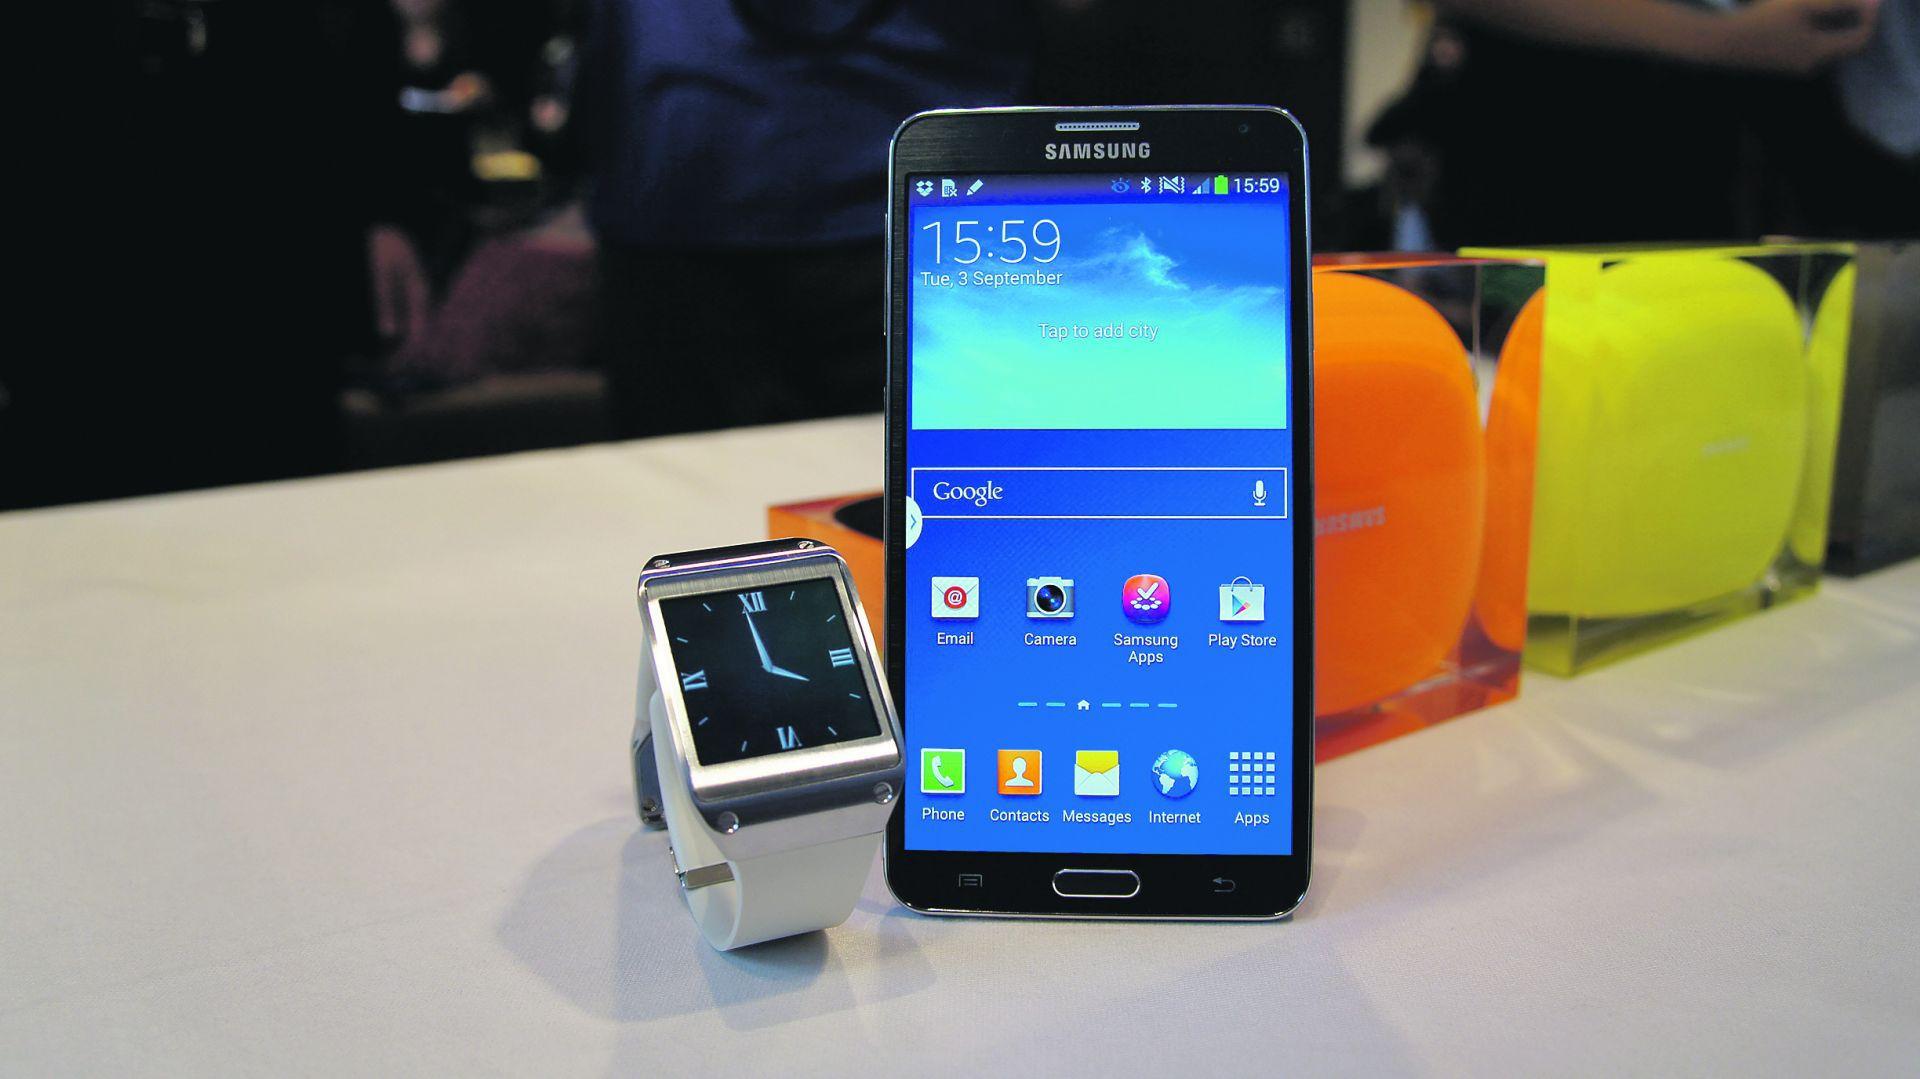 Samsung Galaxy Note 3 Logo Wallpaper Galaxy Note 3 And Samsung